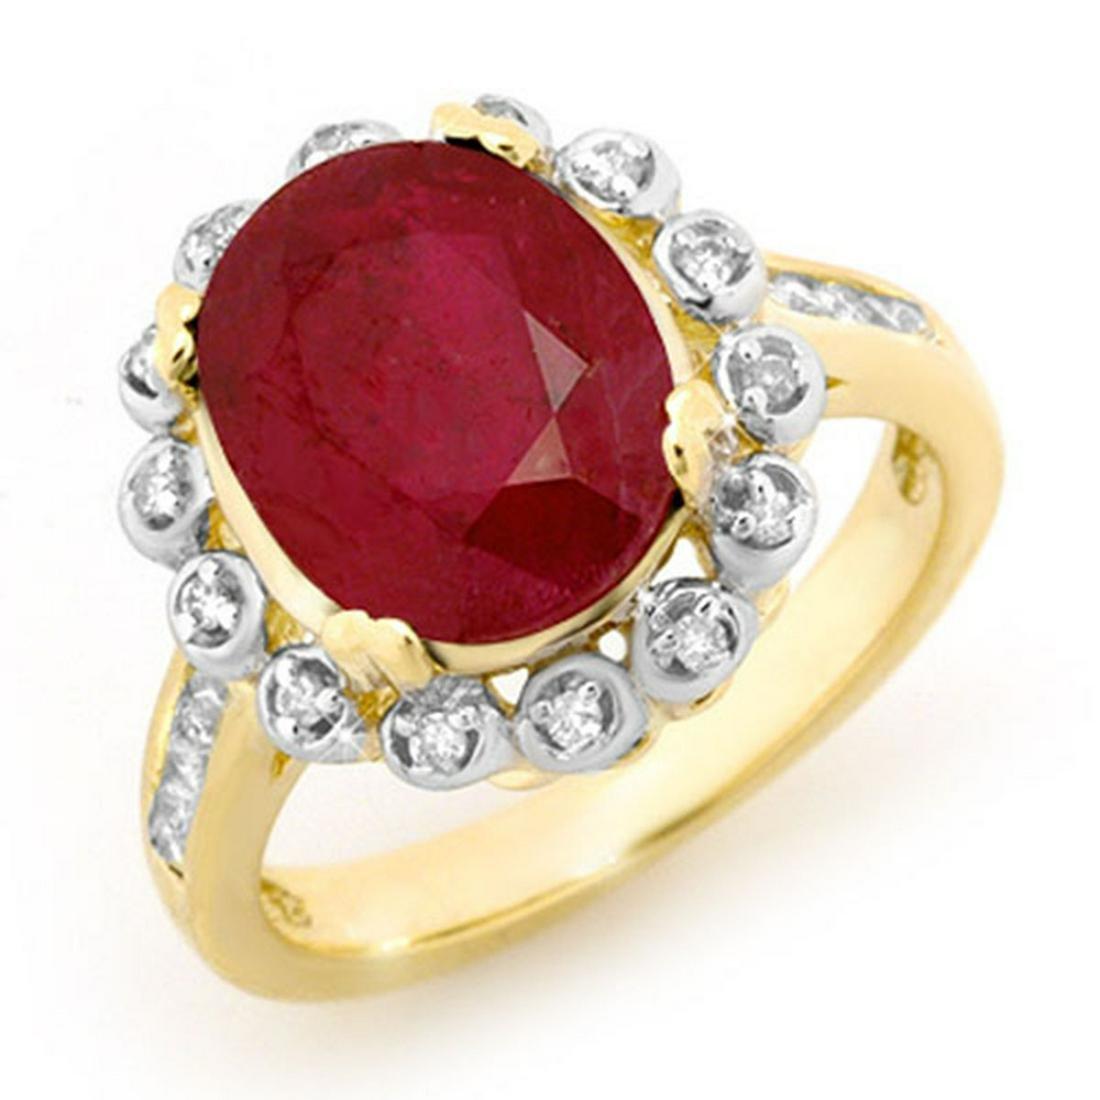 5.83 ctw Ruby & Diamond Ring 10K Yellow Gold